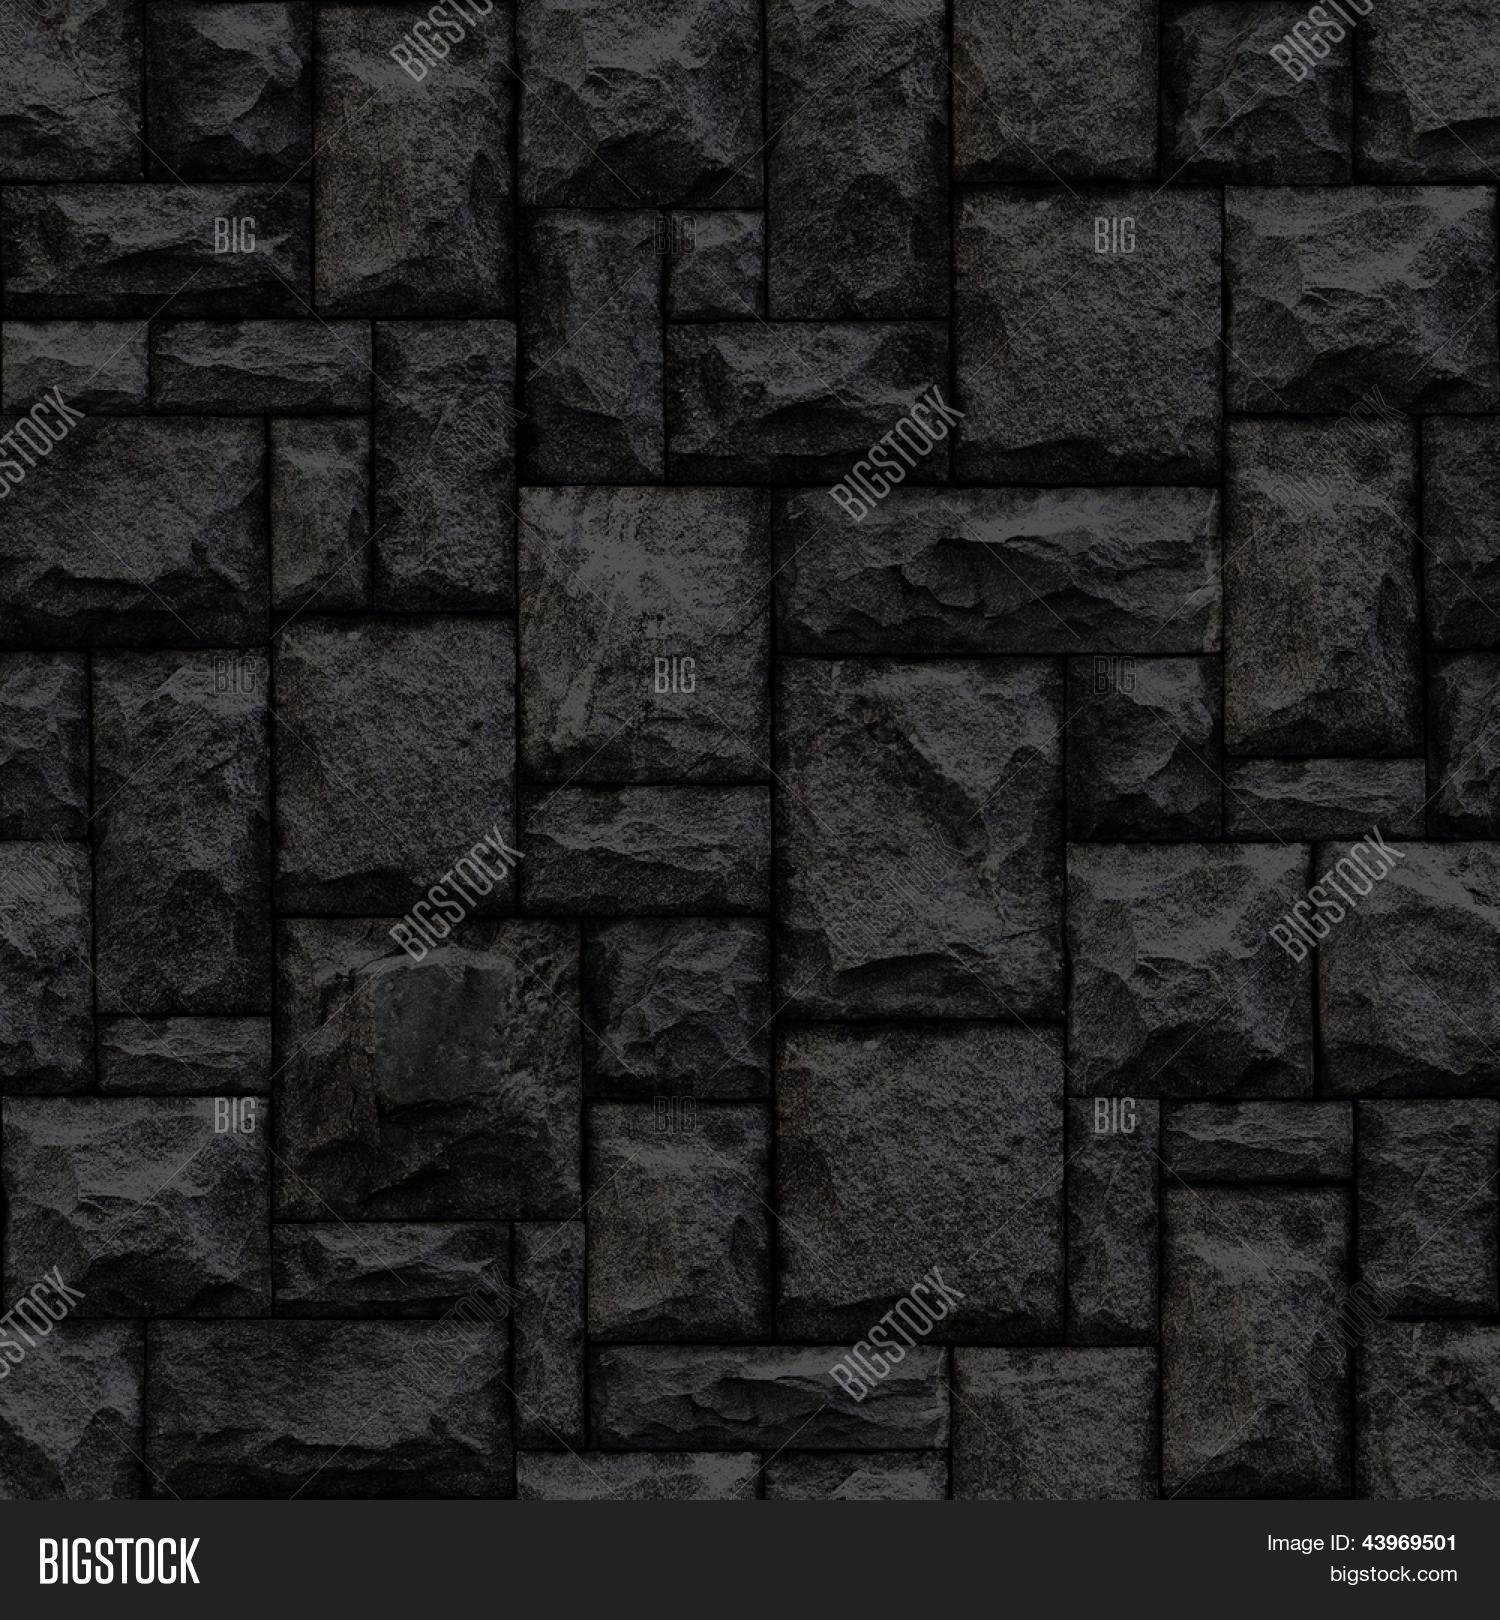 Seamlessly Black Image Photo Trial Bigstock 1500x1620